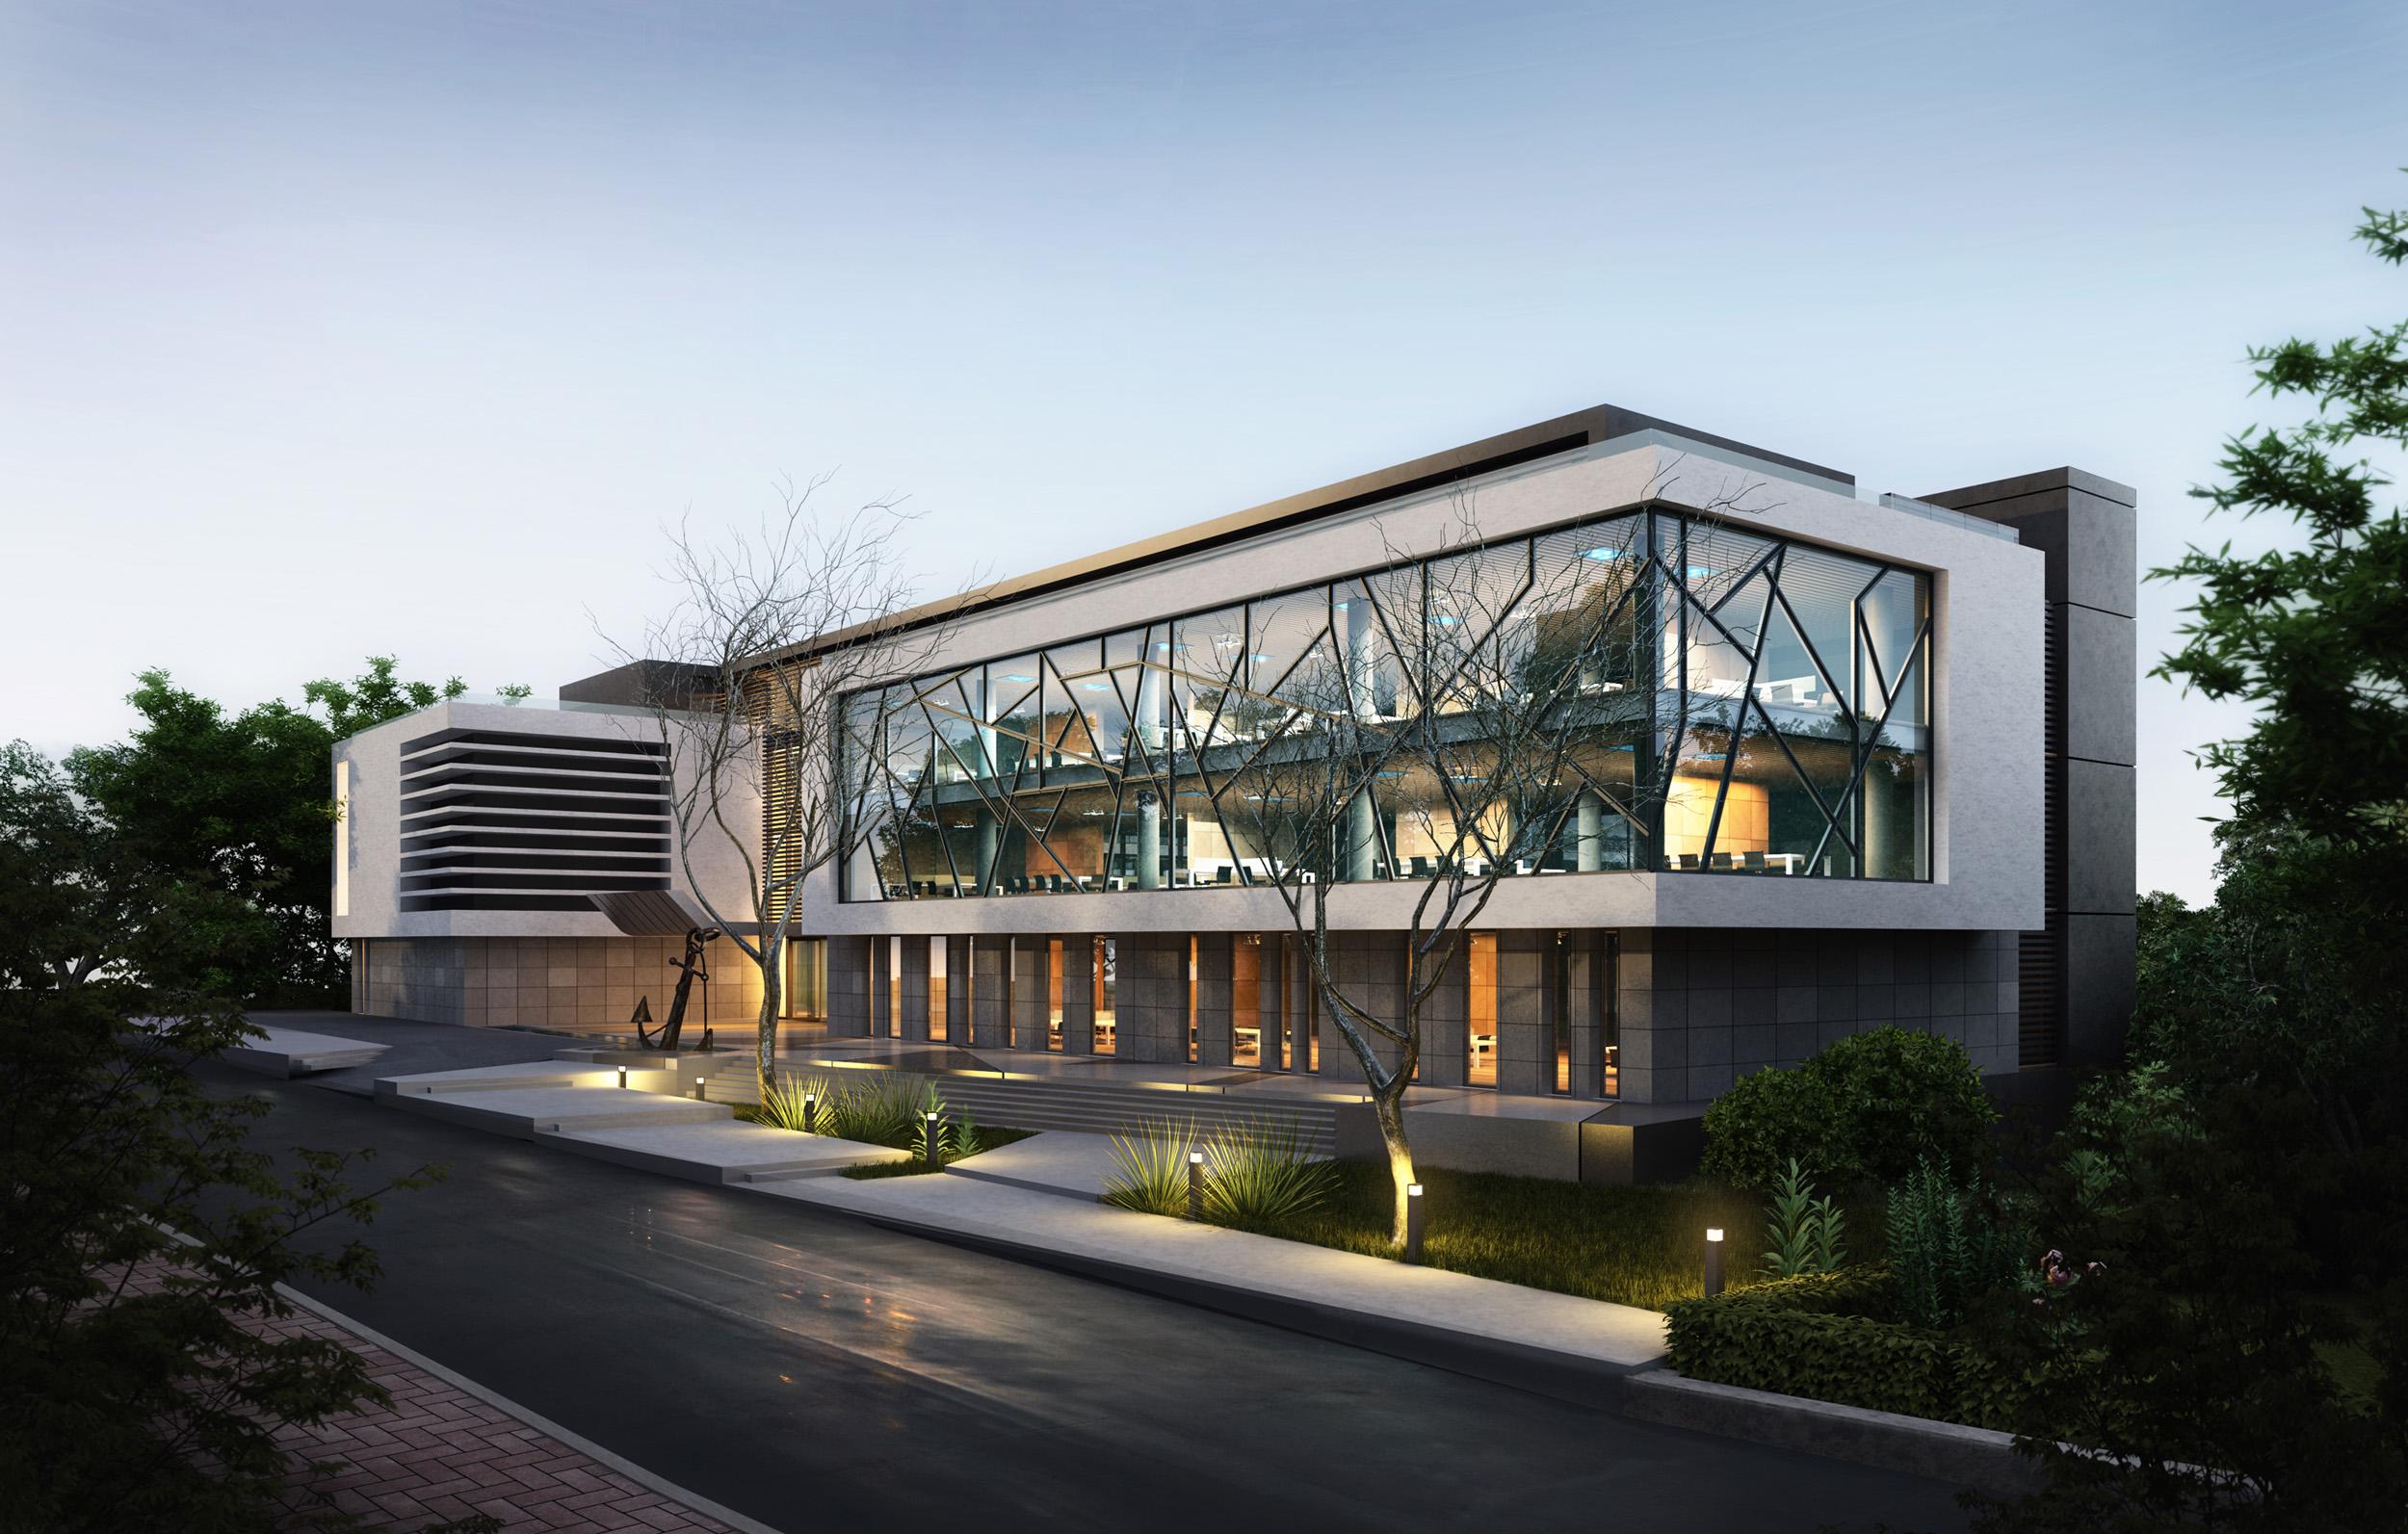 Shipping office altunizade by ertugy on deviantart for Modern office exterior design